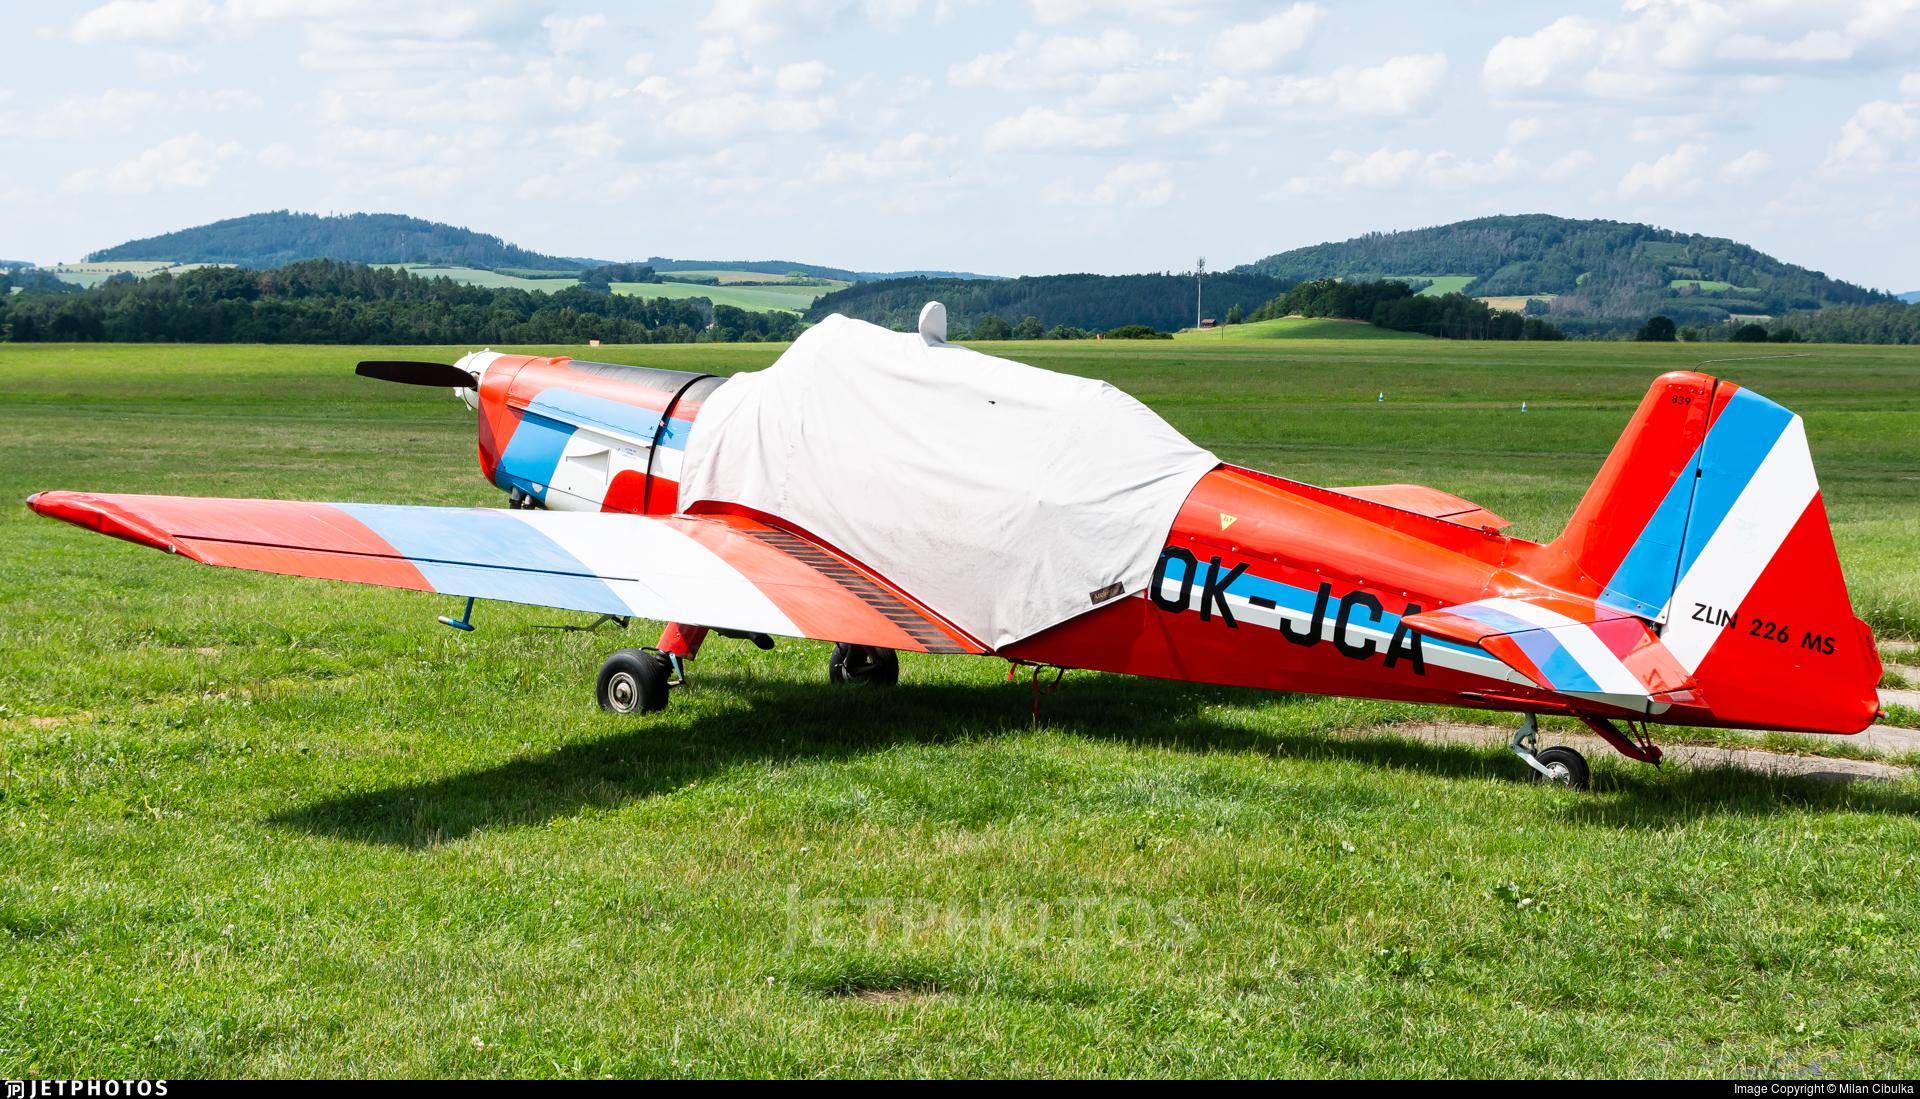 OK-JCA - Zlin 226MS - Private